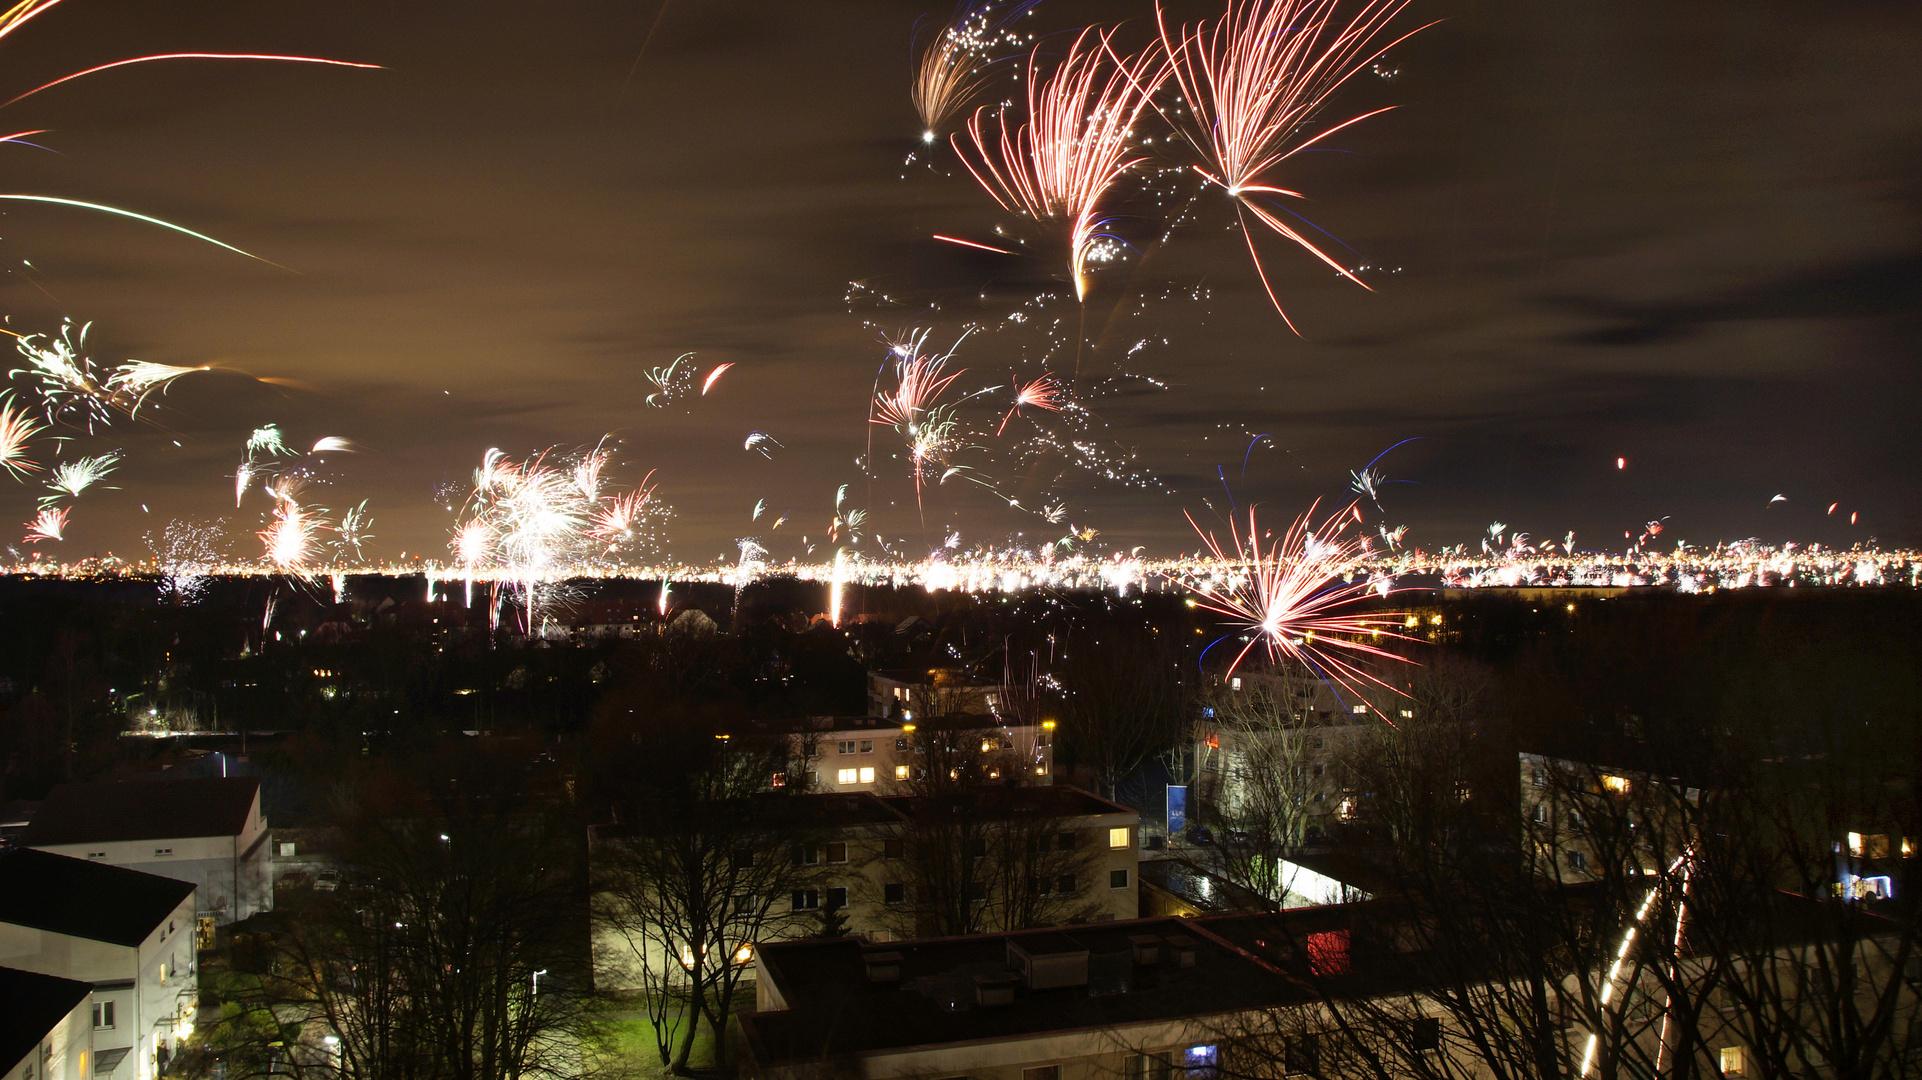 Feuerwerk Silvester 2014